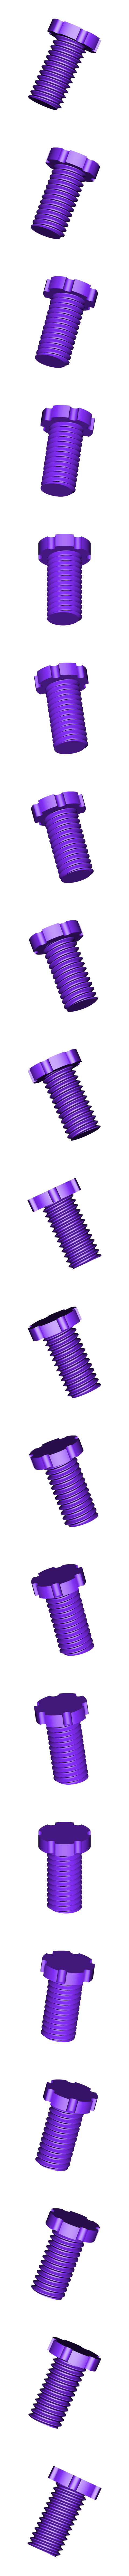 Screw_2.stl Download free STL file Phone Next To • 3D print model, iguigui